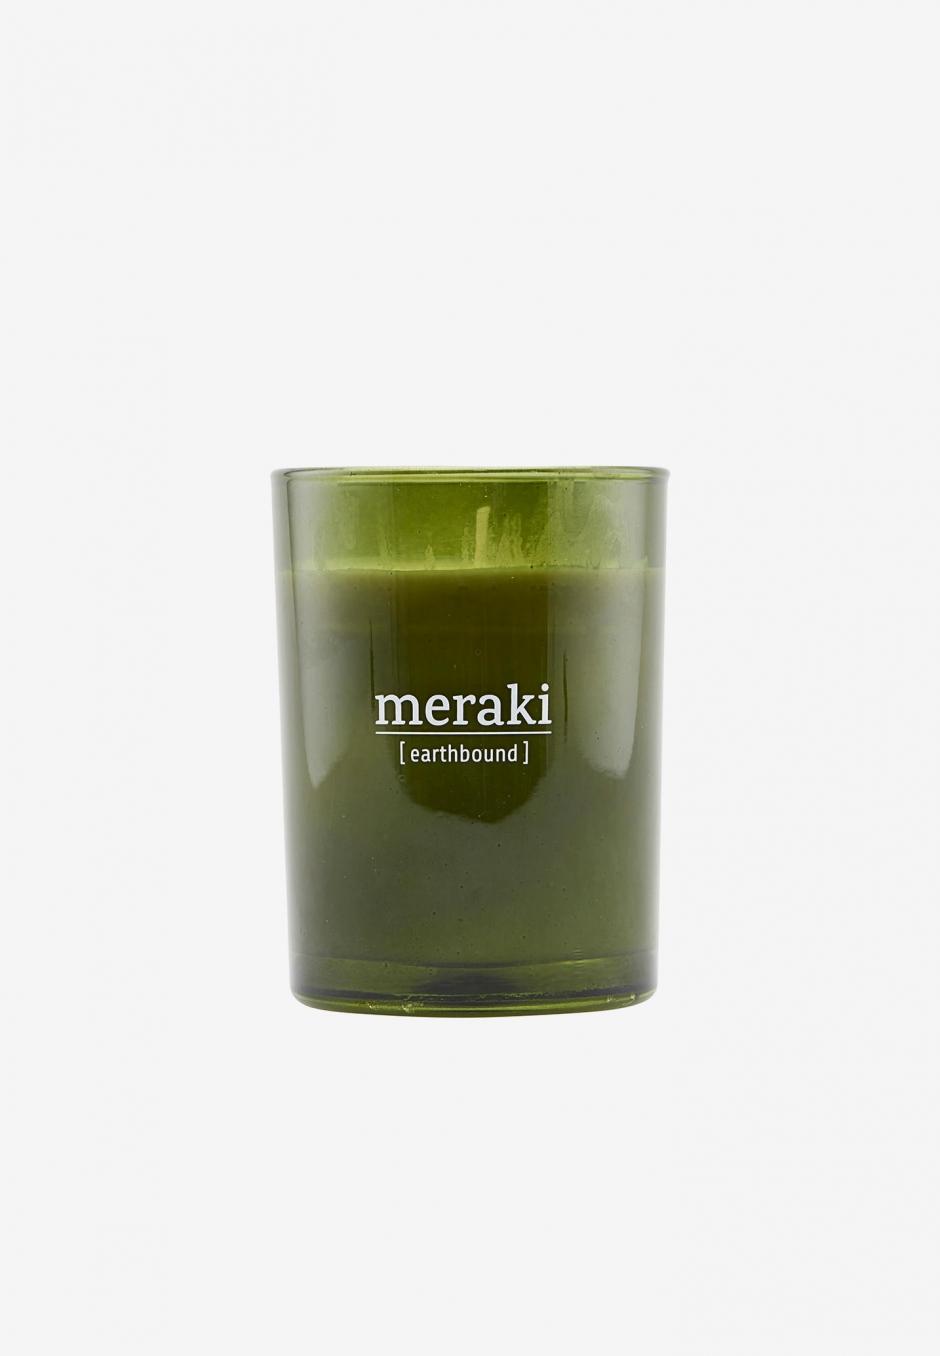 Meraki Scented Candle Earhtbound